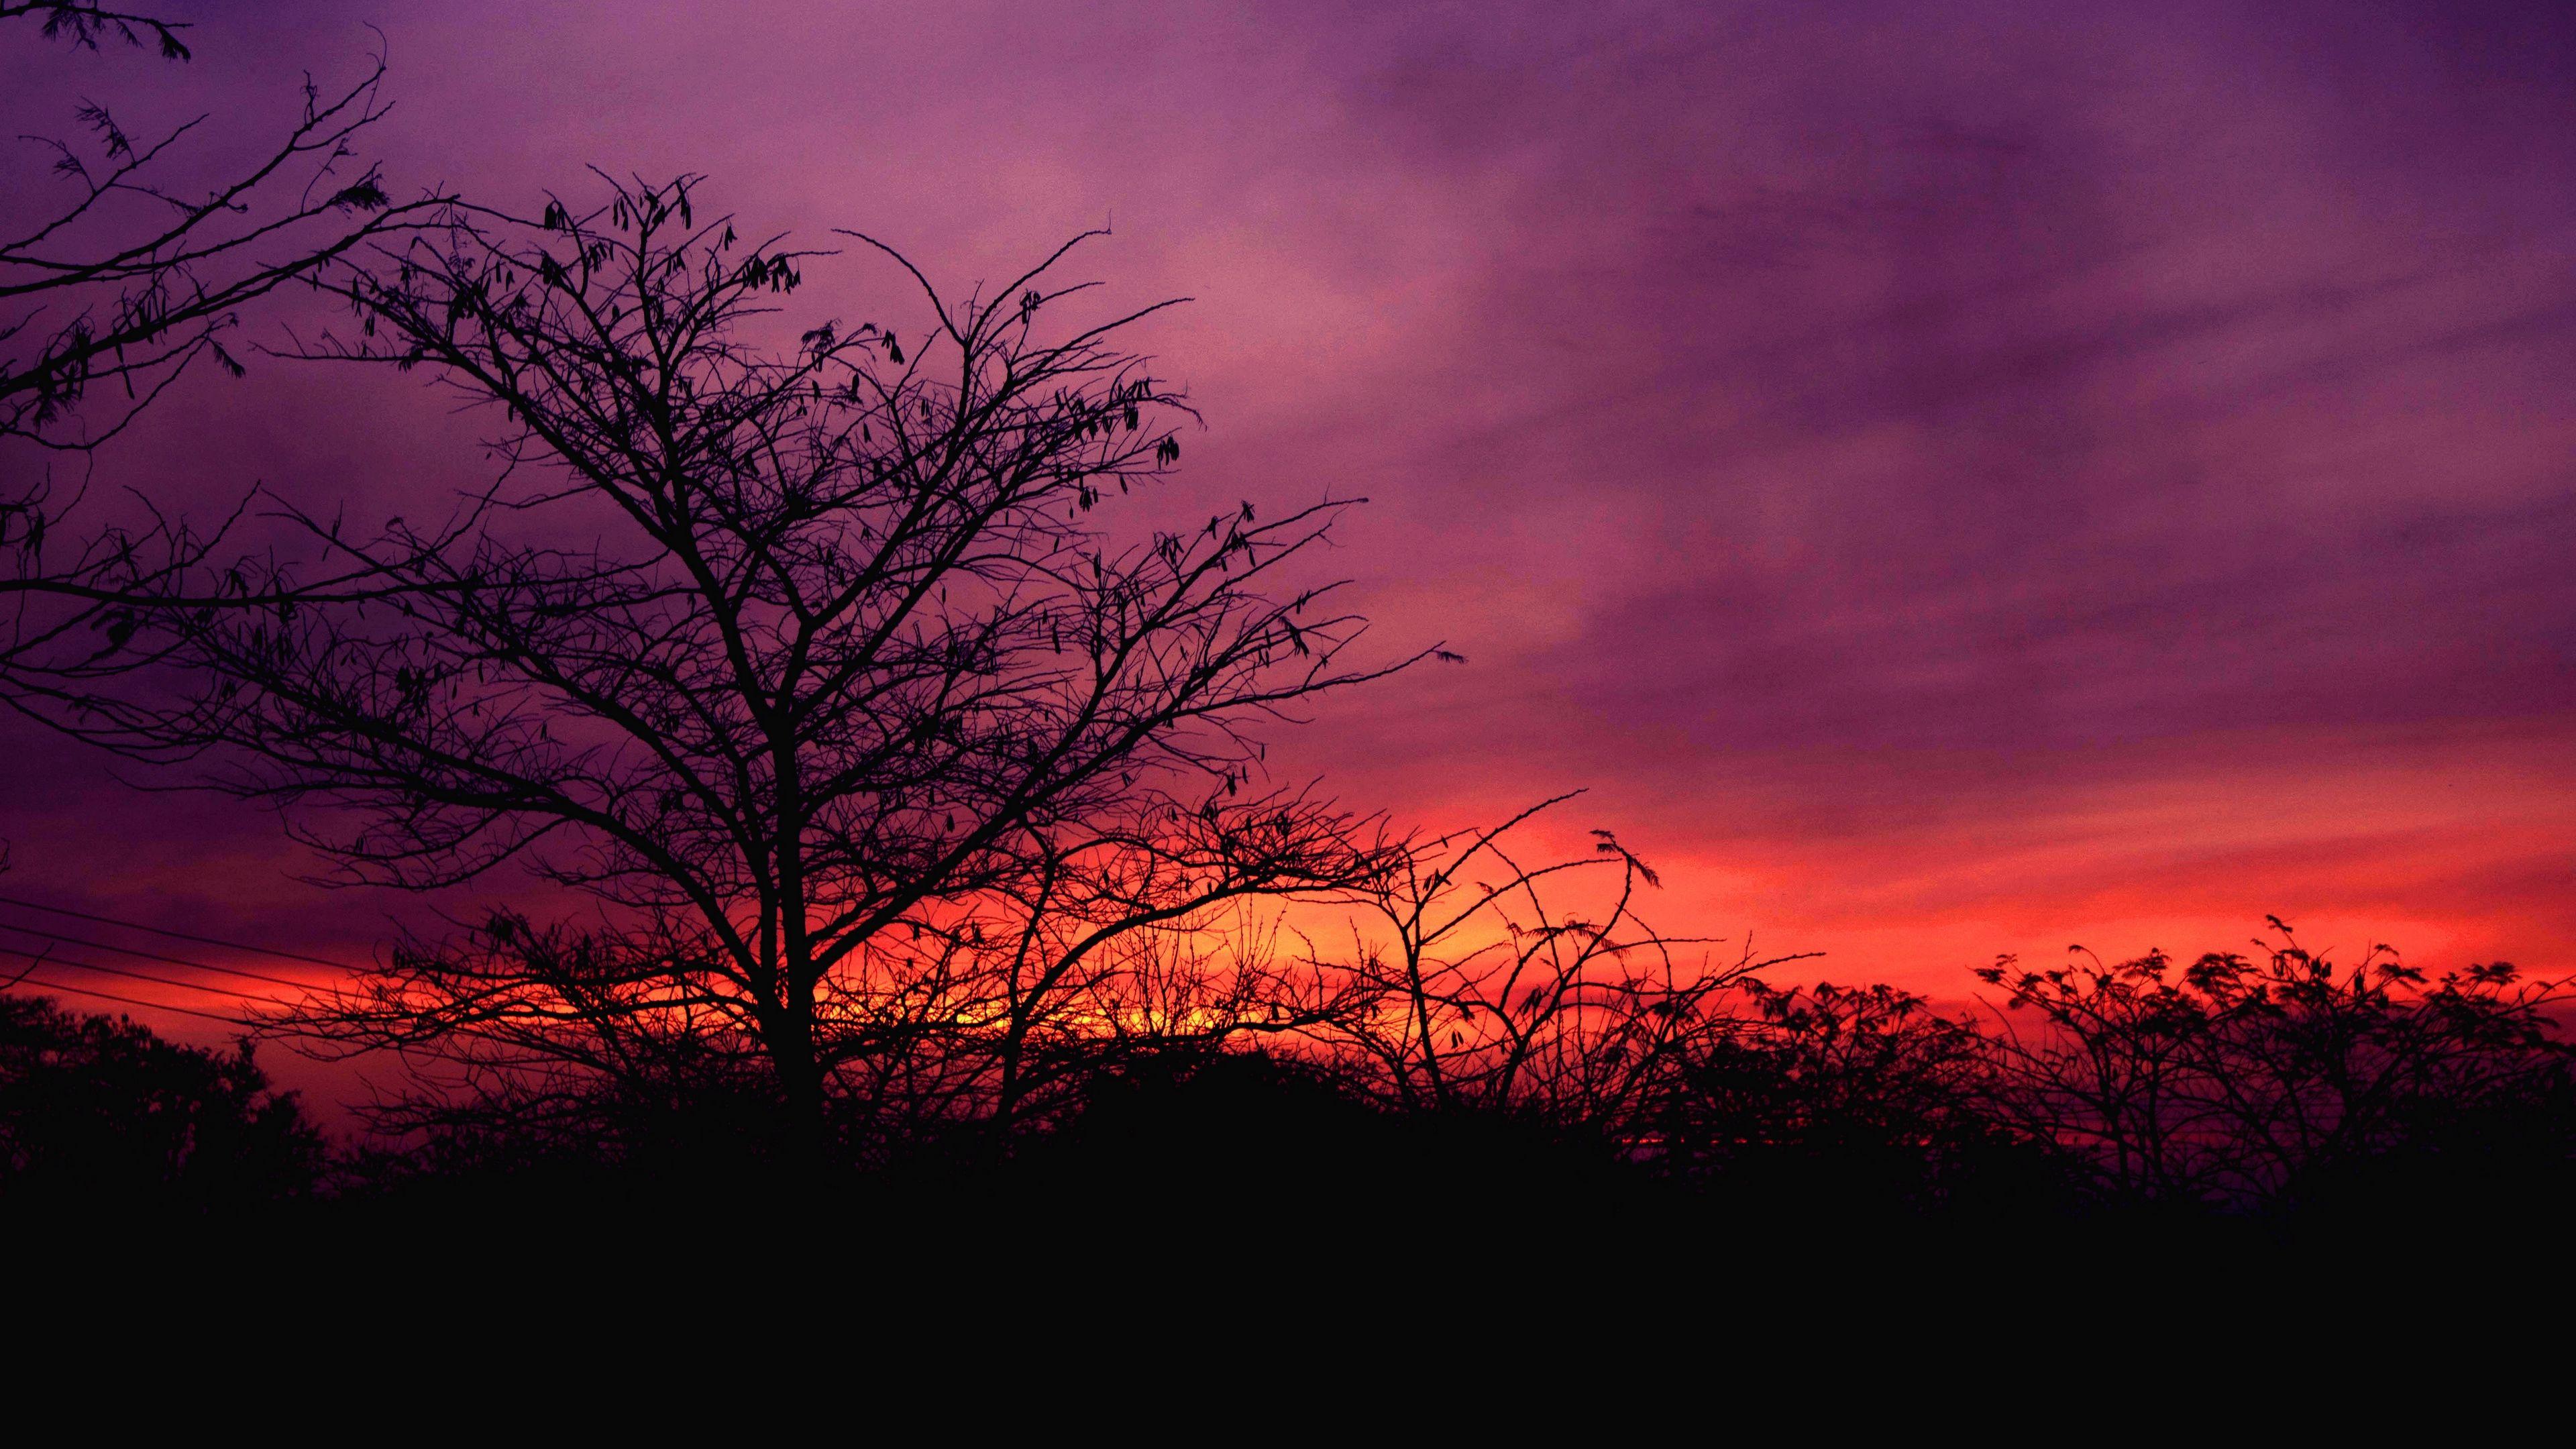 Tree Sunset Sky Clouds 4k Tree Sunset Sky Tree Sunset Wallpaper Sunset Wallpaper Nature Wallpaper Pink sky sunset sun trees nature